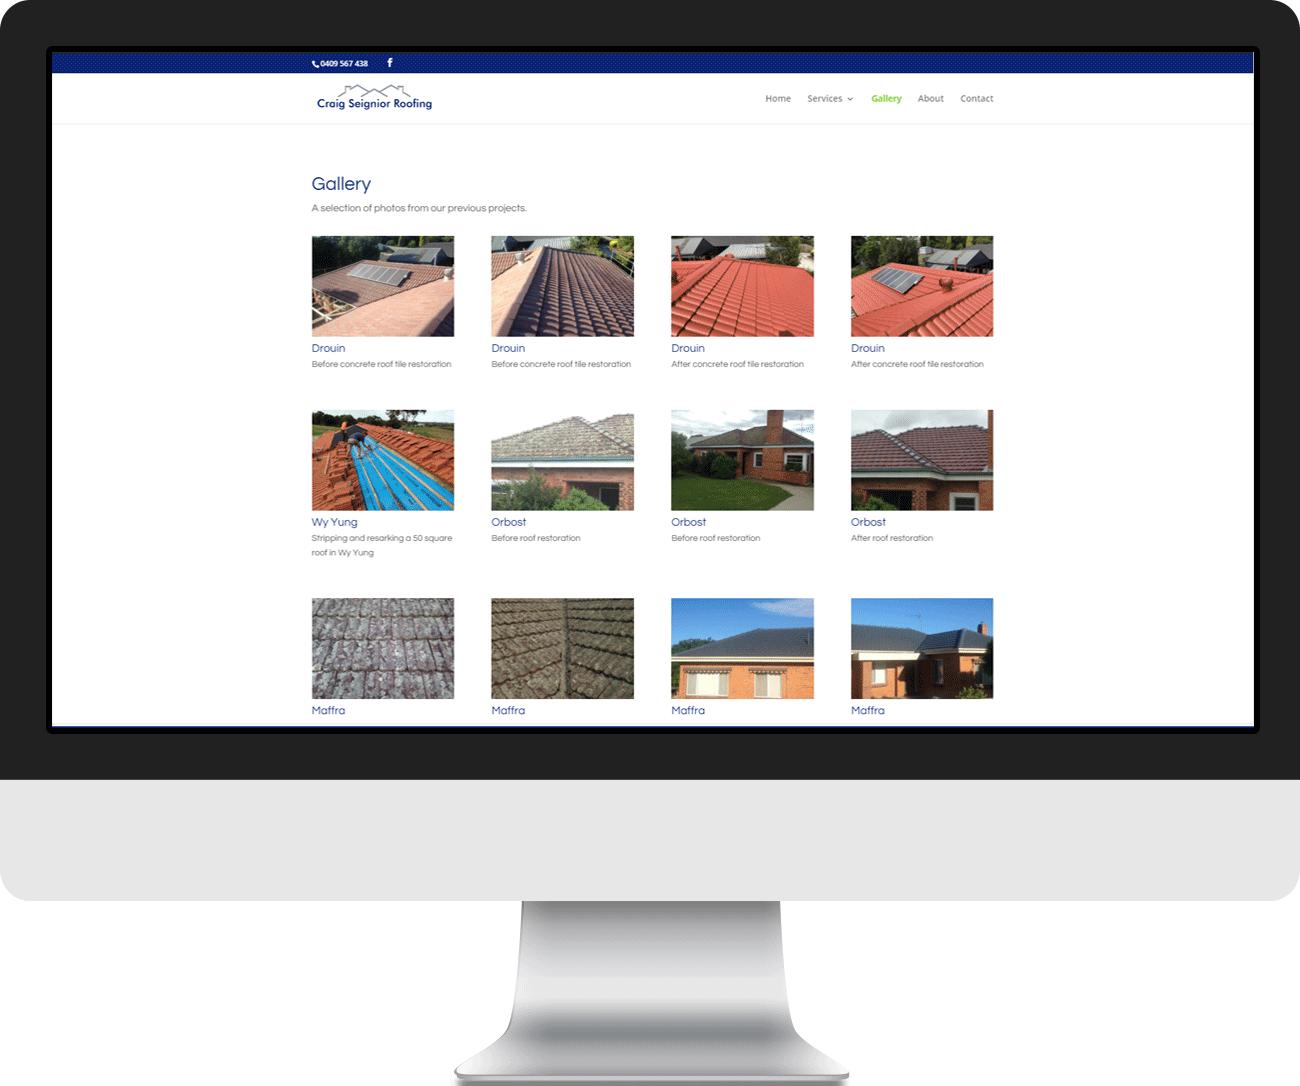 roof-restorer-gippsland